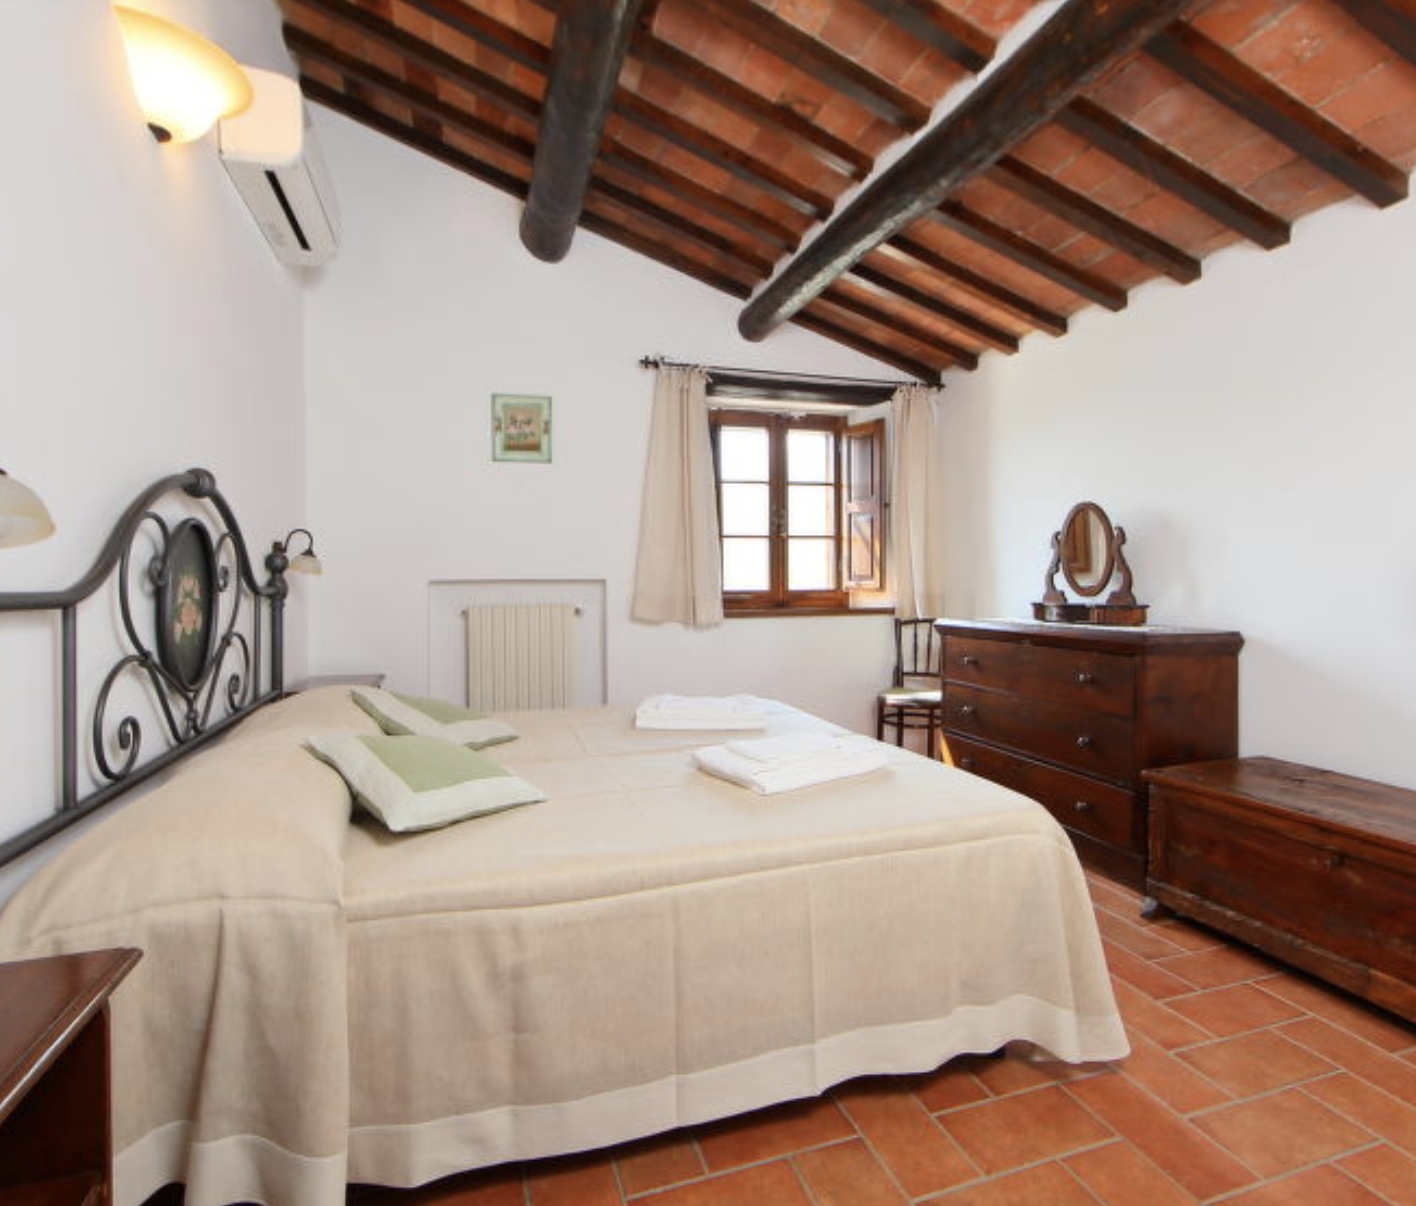 Camere Podere San Giuseppe Radicofani Siena